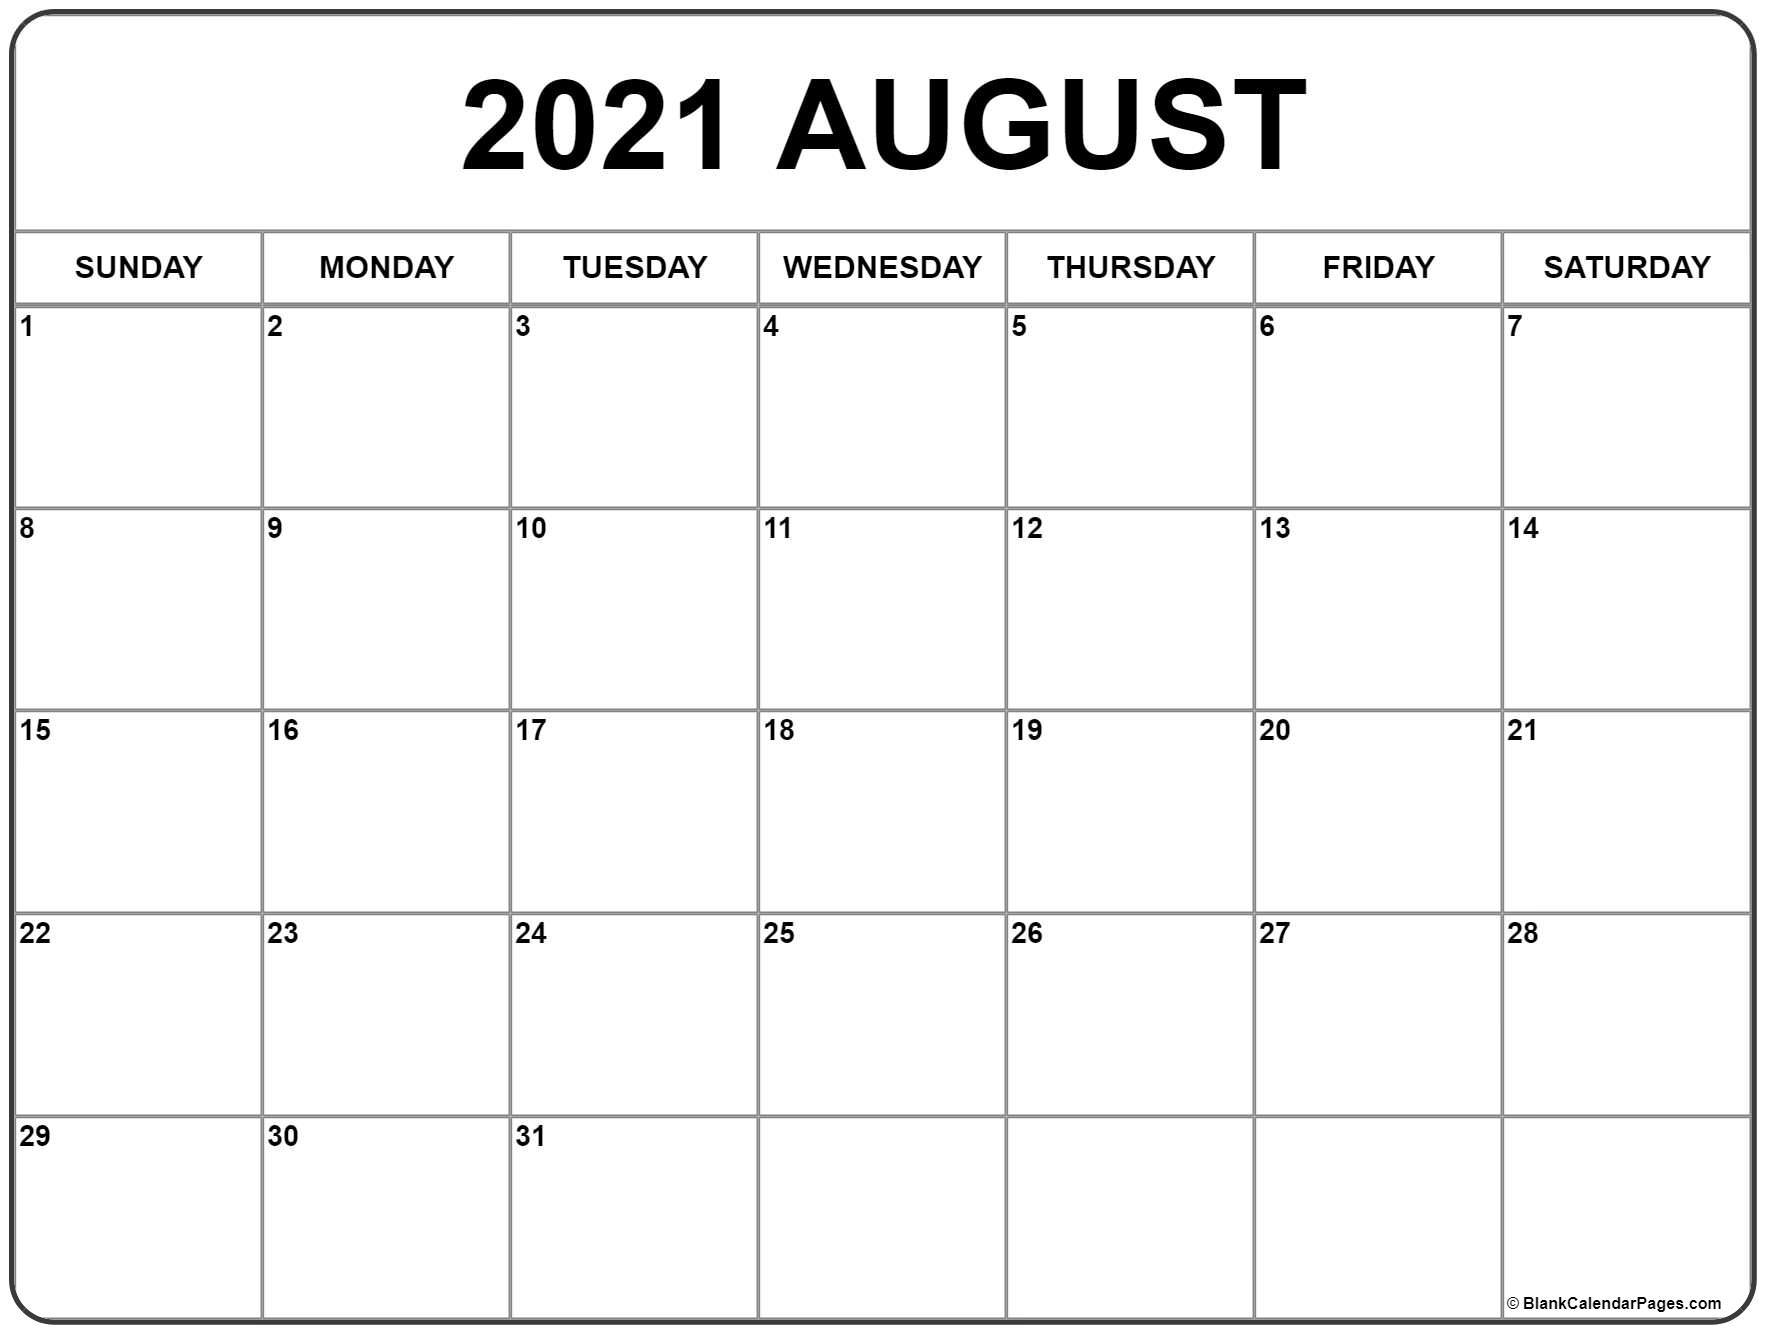 Take 2021 August Calendar Print Out